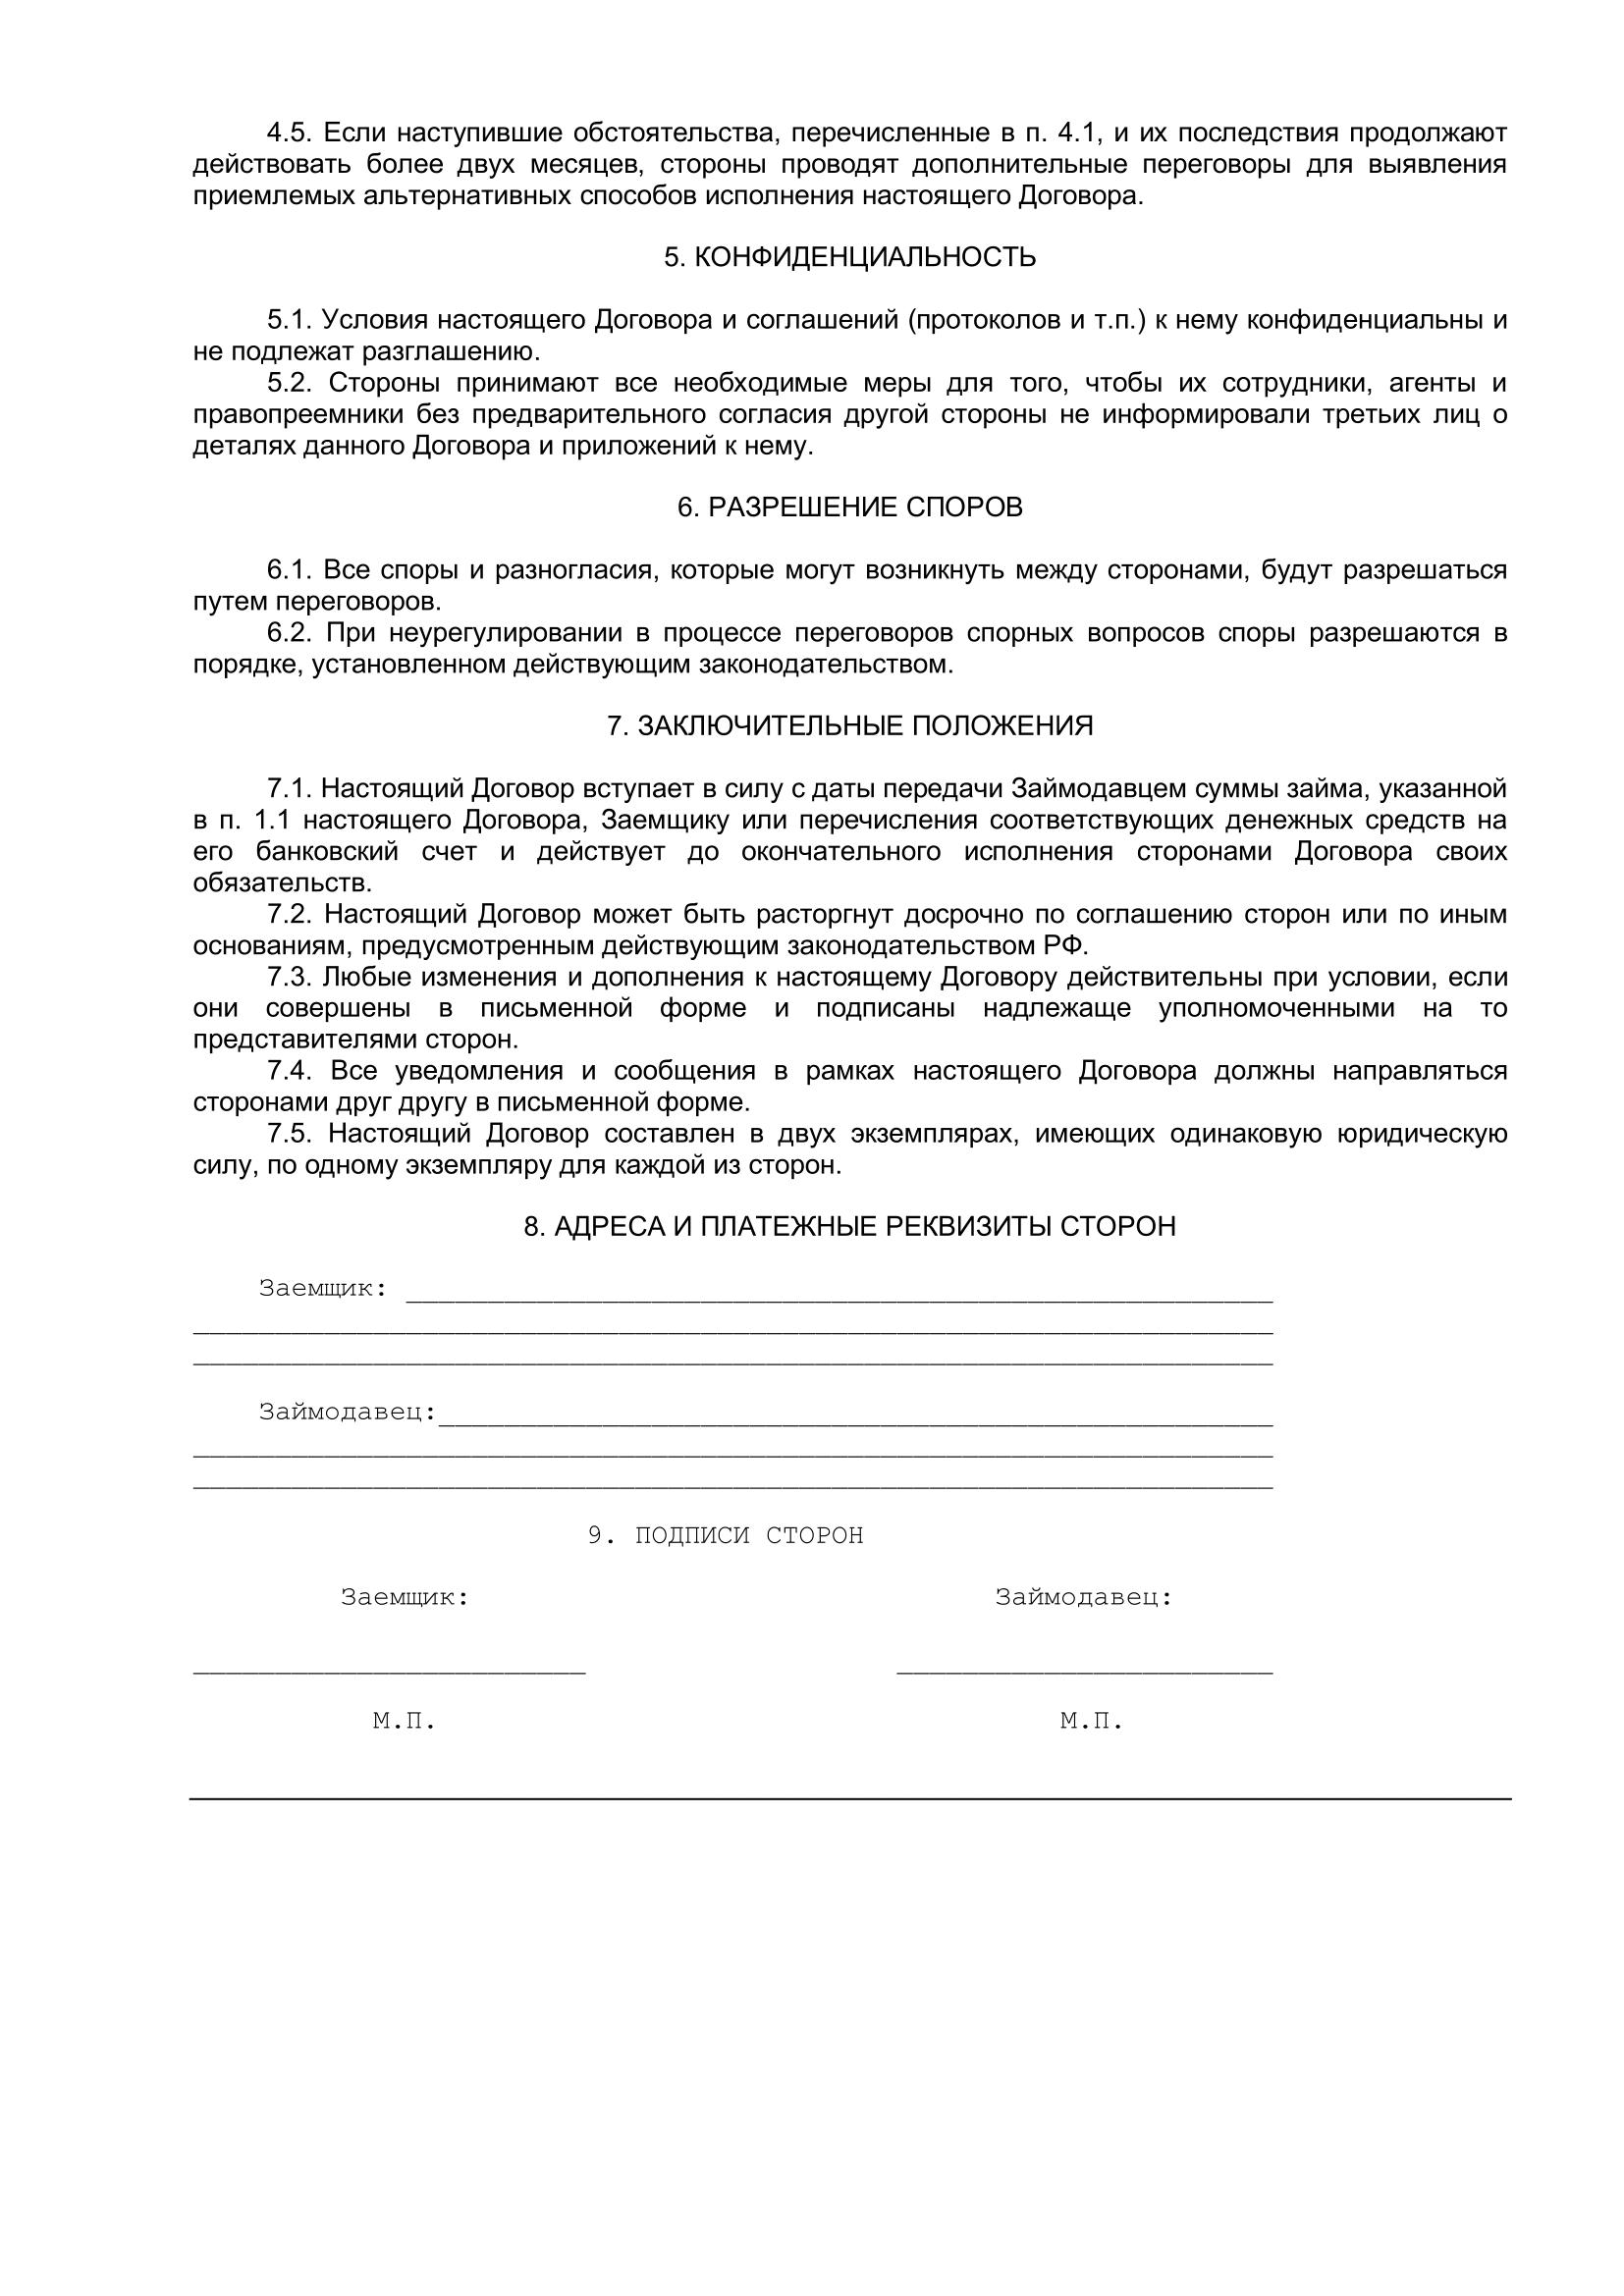 Образец договора займа 2